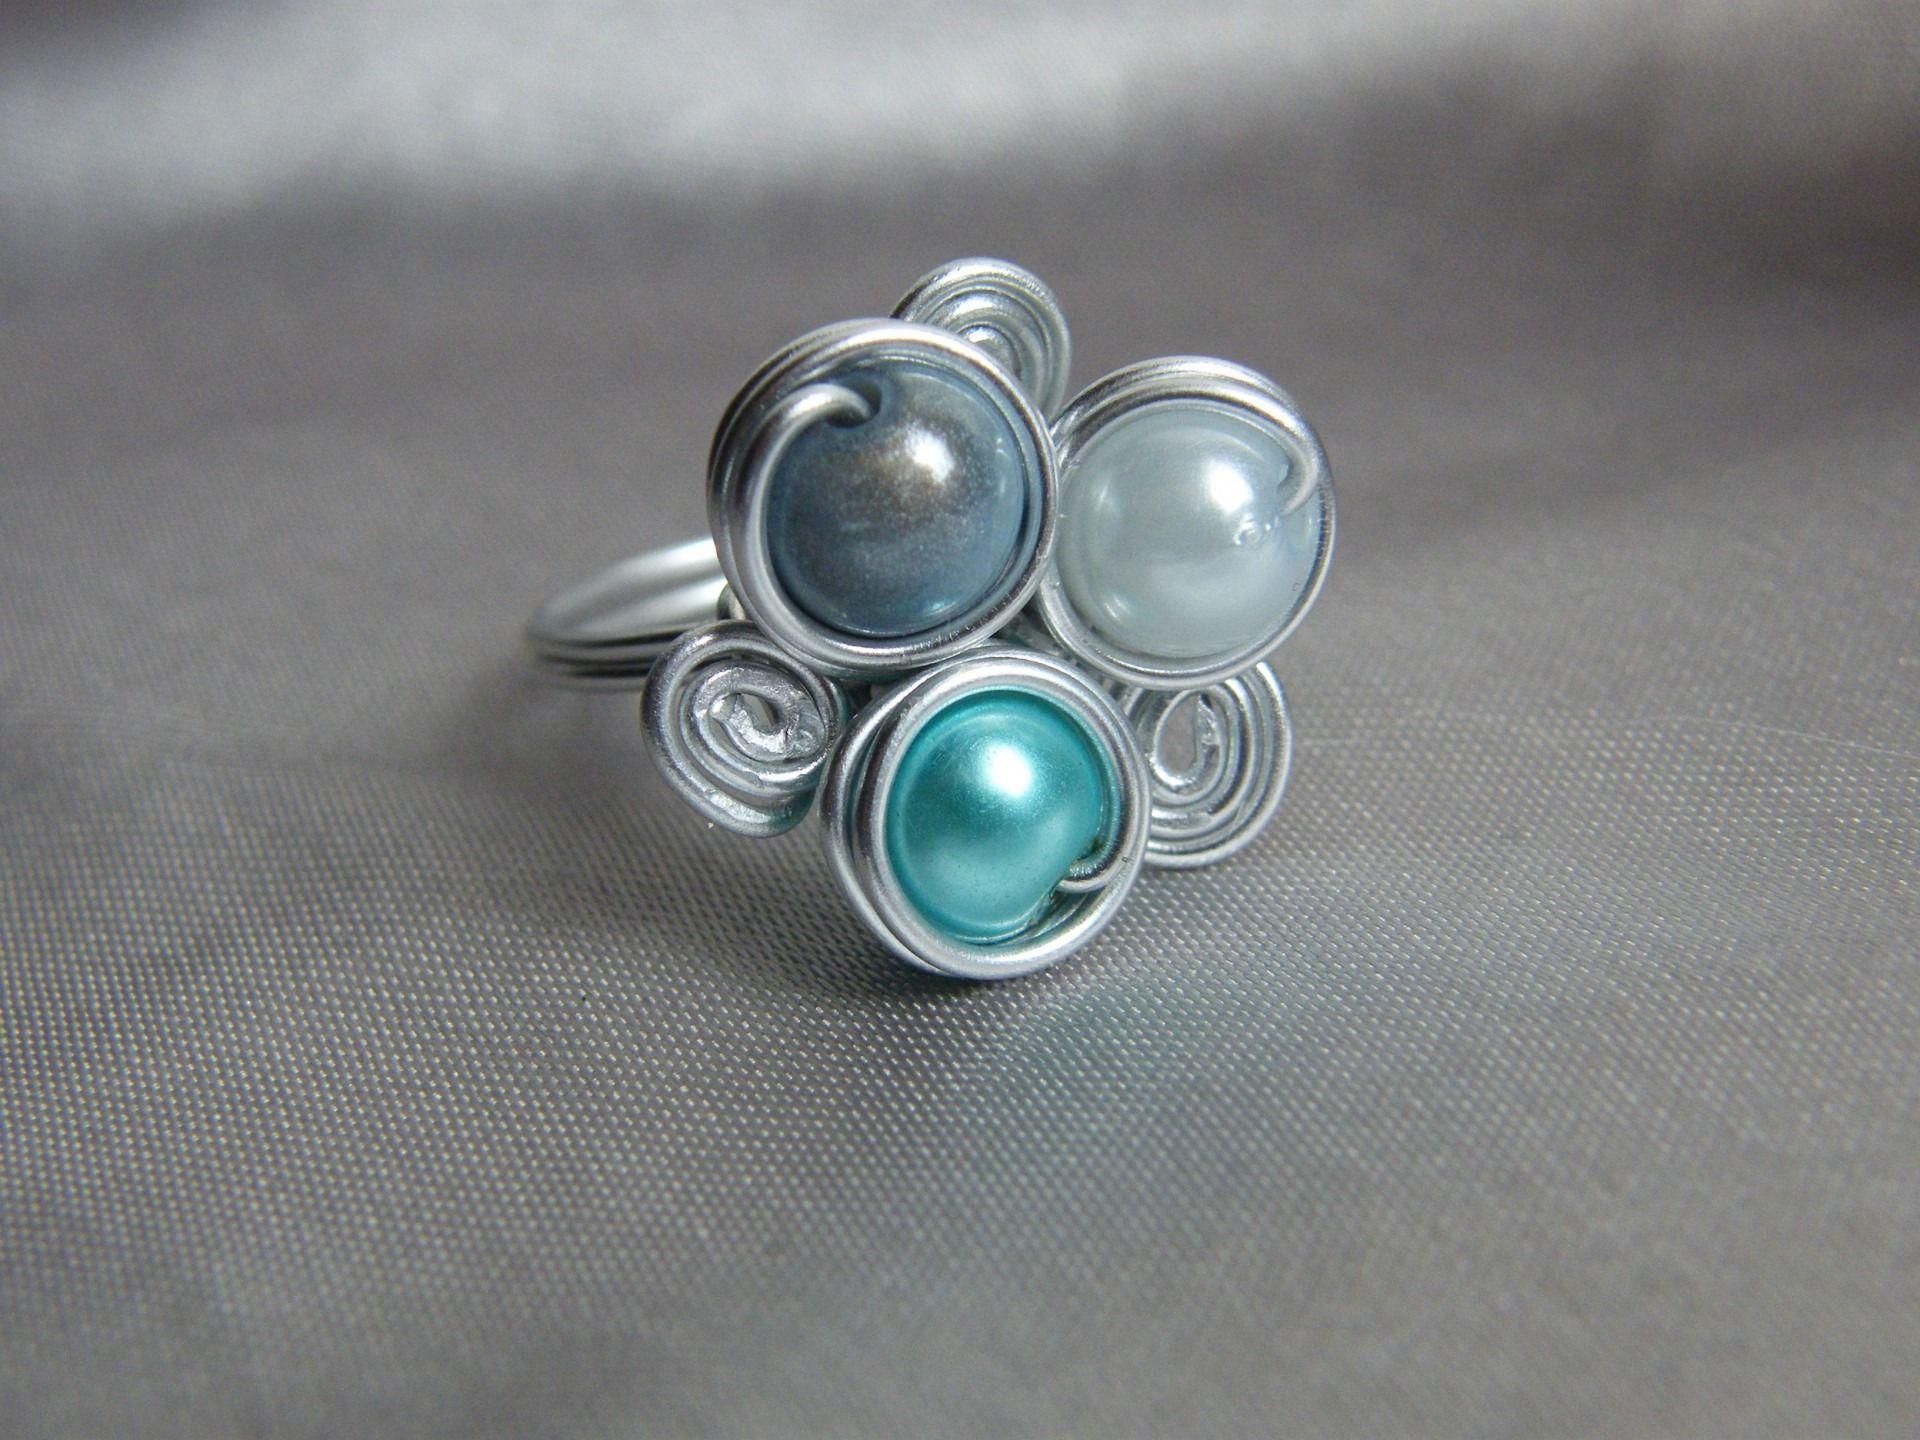 bijoux fil aluminium recherche google bijoux pinterest bagues bijou et fil. Black Bedroom Furniture Sets. Home Design Ideas